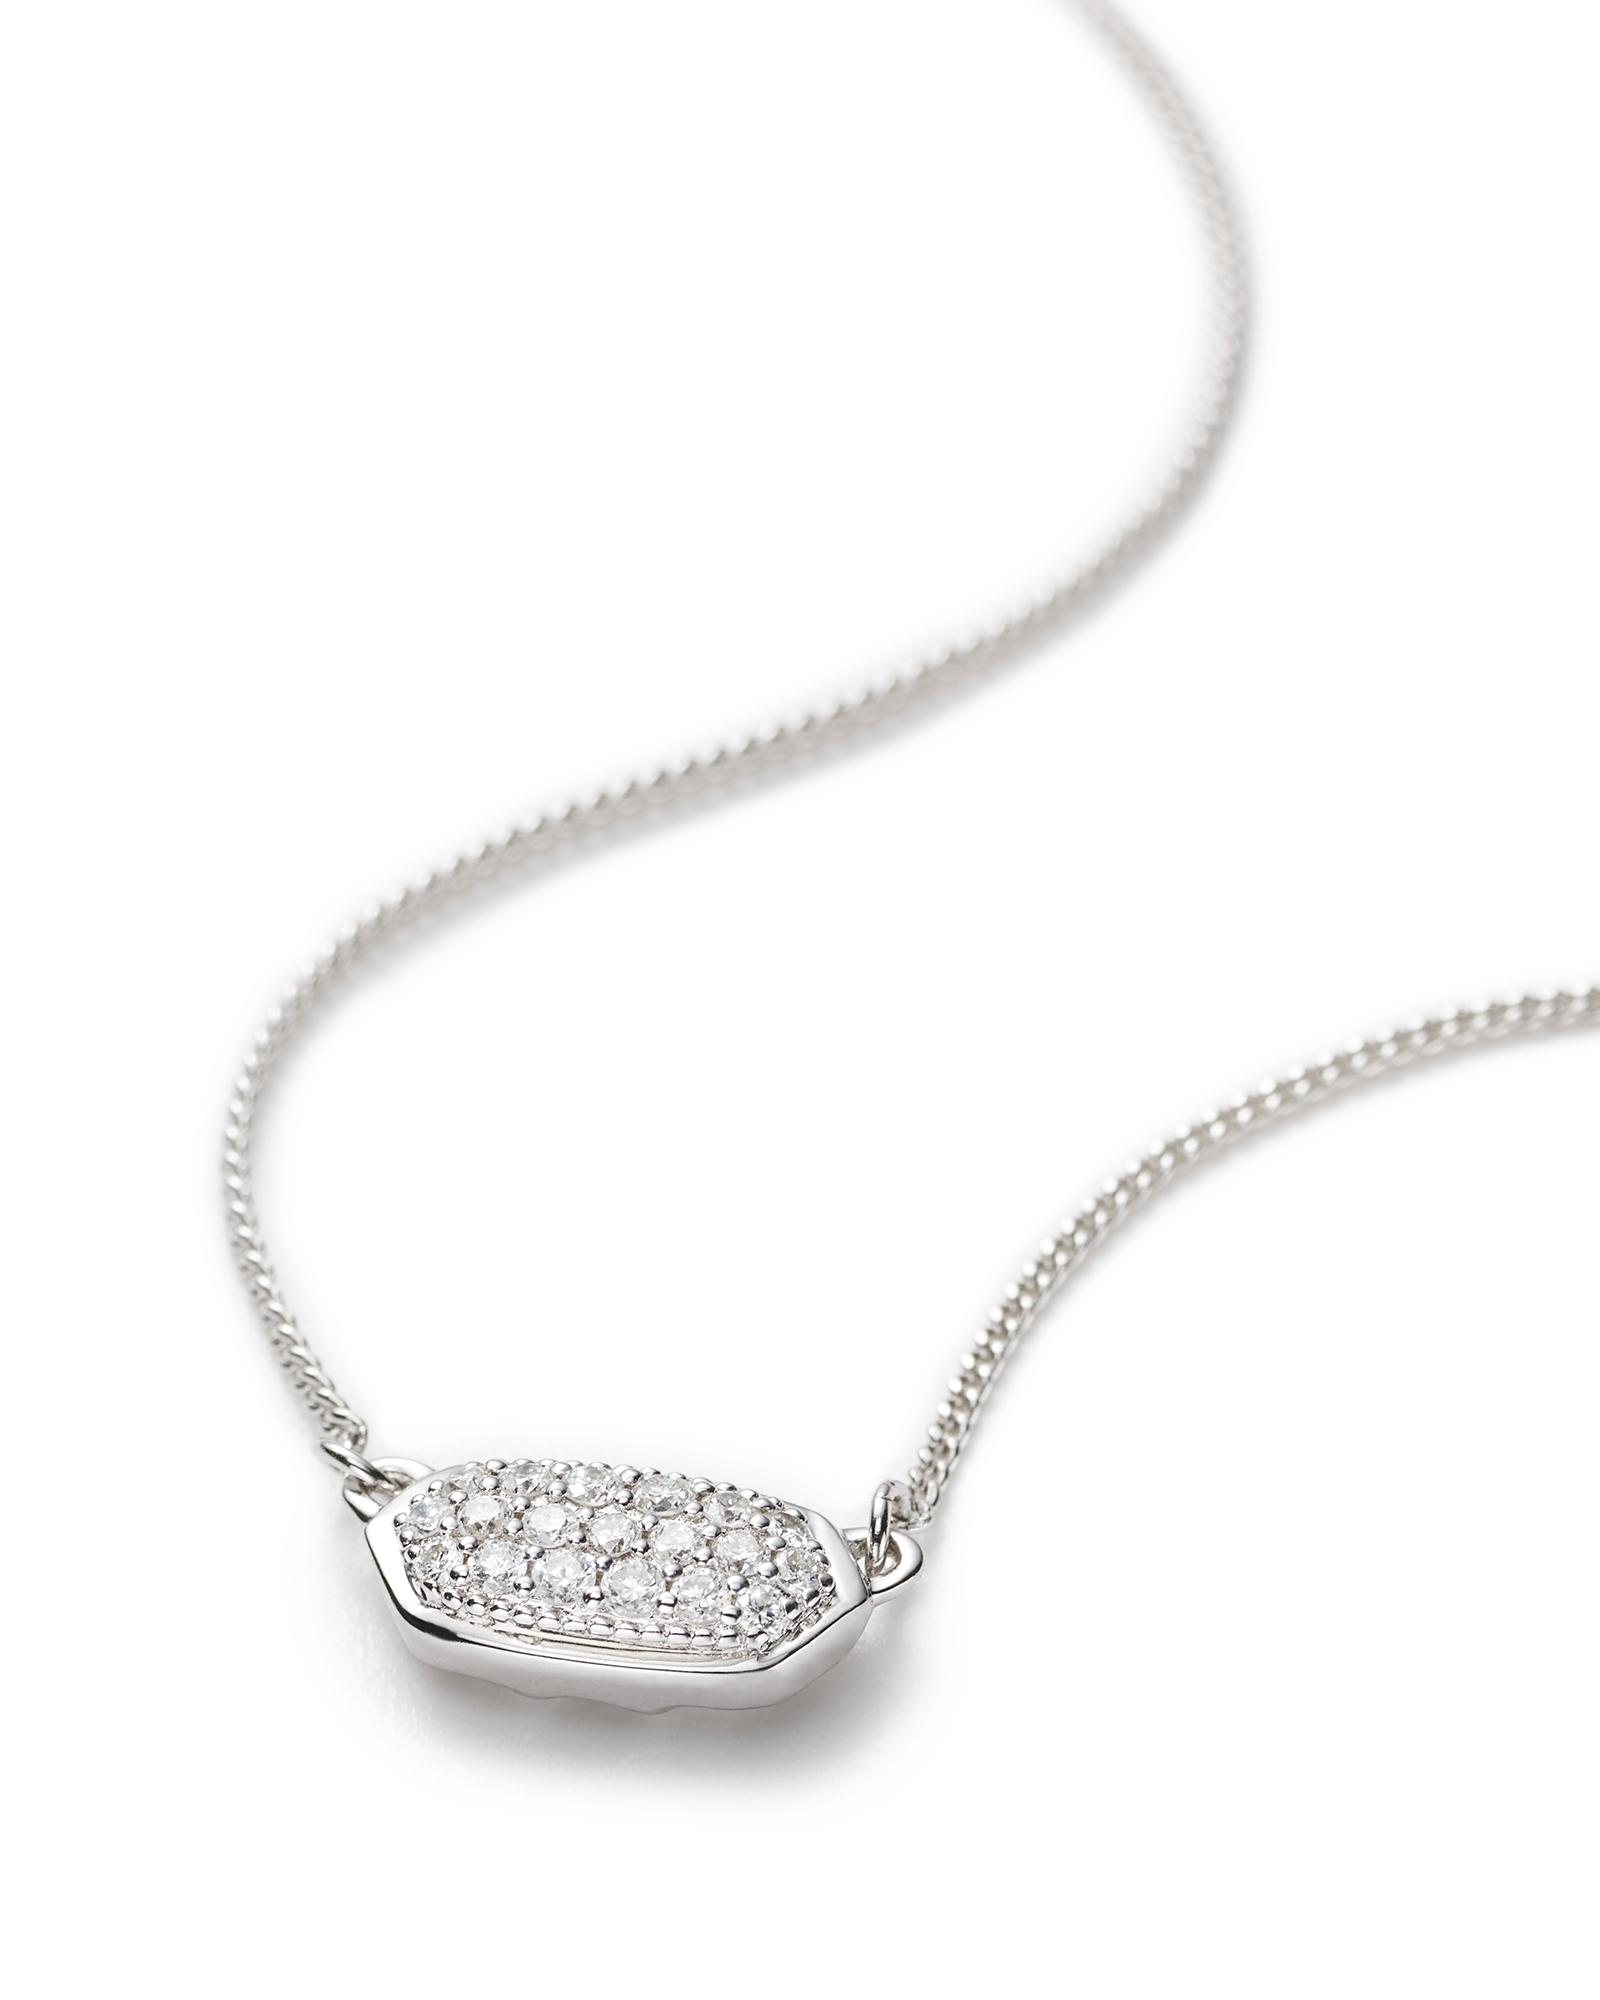 Lisa necklace pave diamond and 14k white gold kendra scott lisa pendant necklace in pave diamond and 14k white gold aloadofball Choice Image